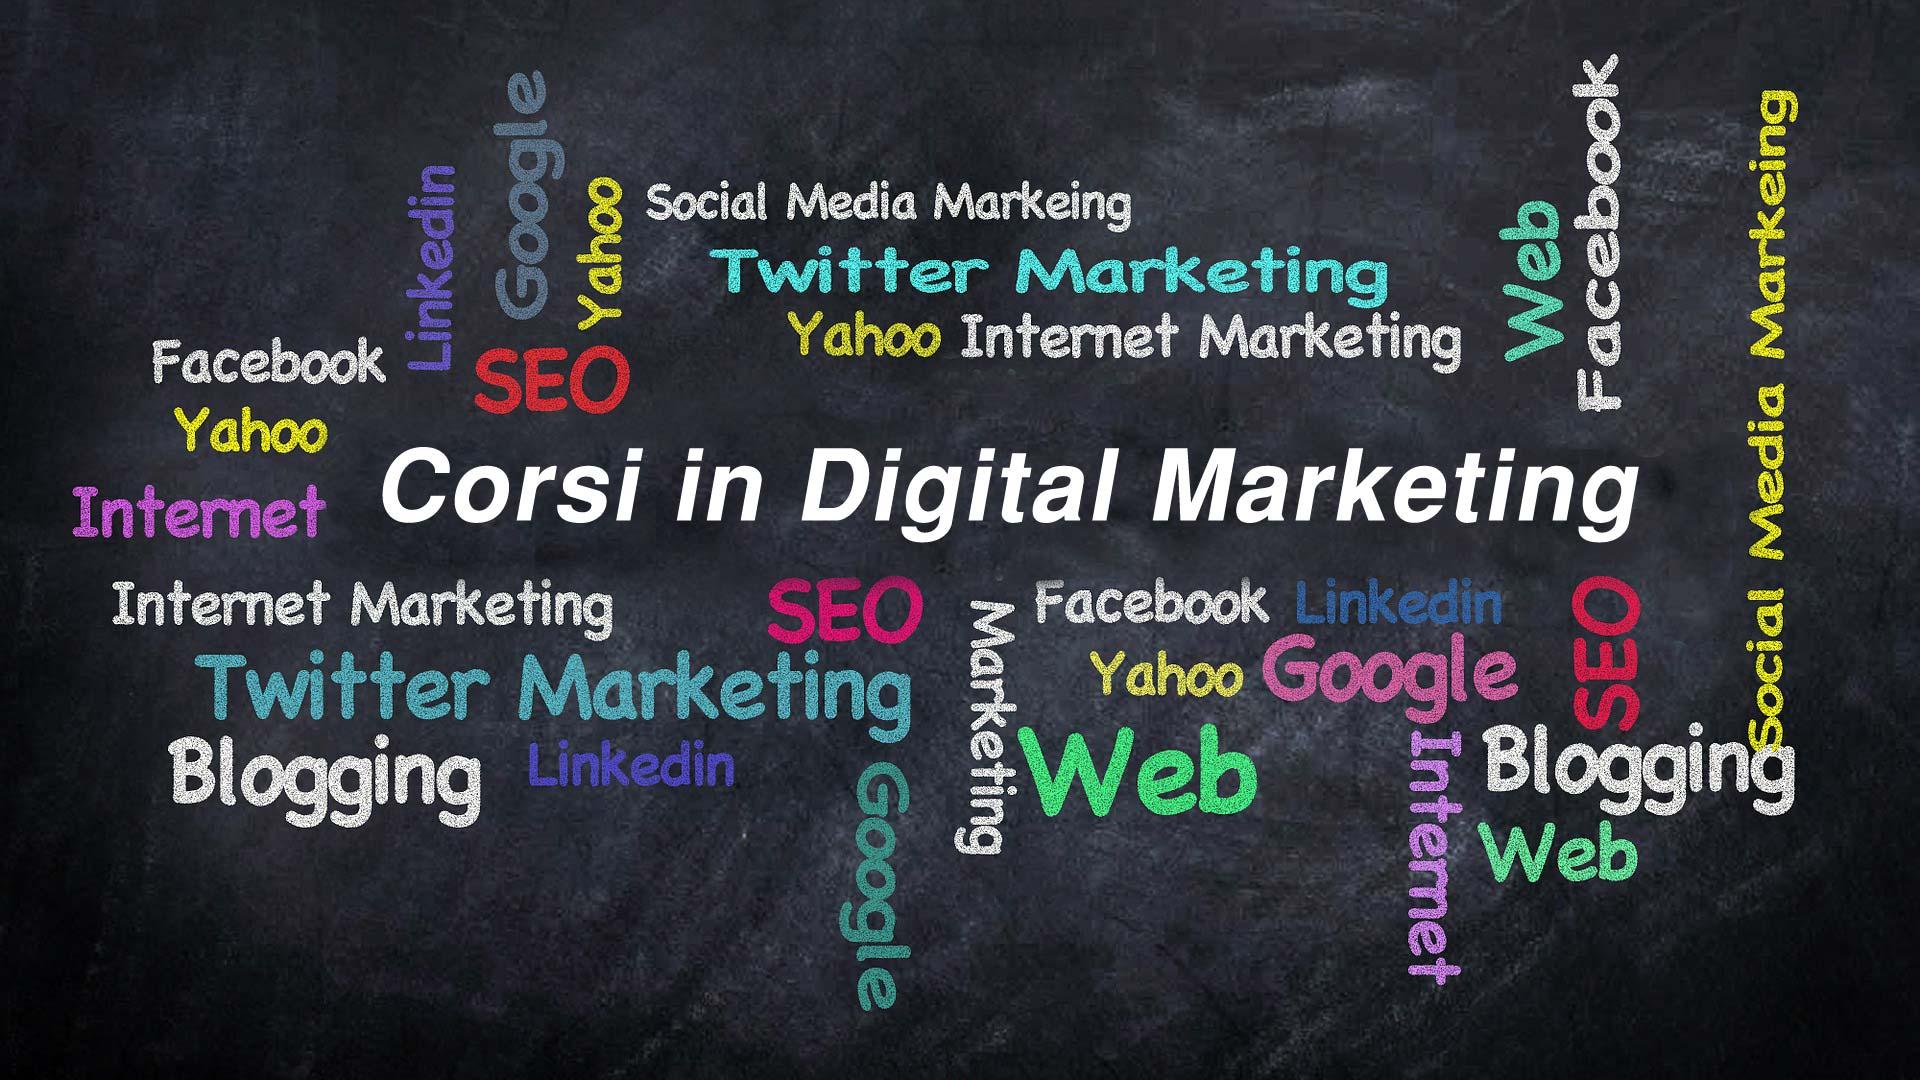 Corsi in Digital Marketing by Digital-University